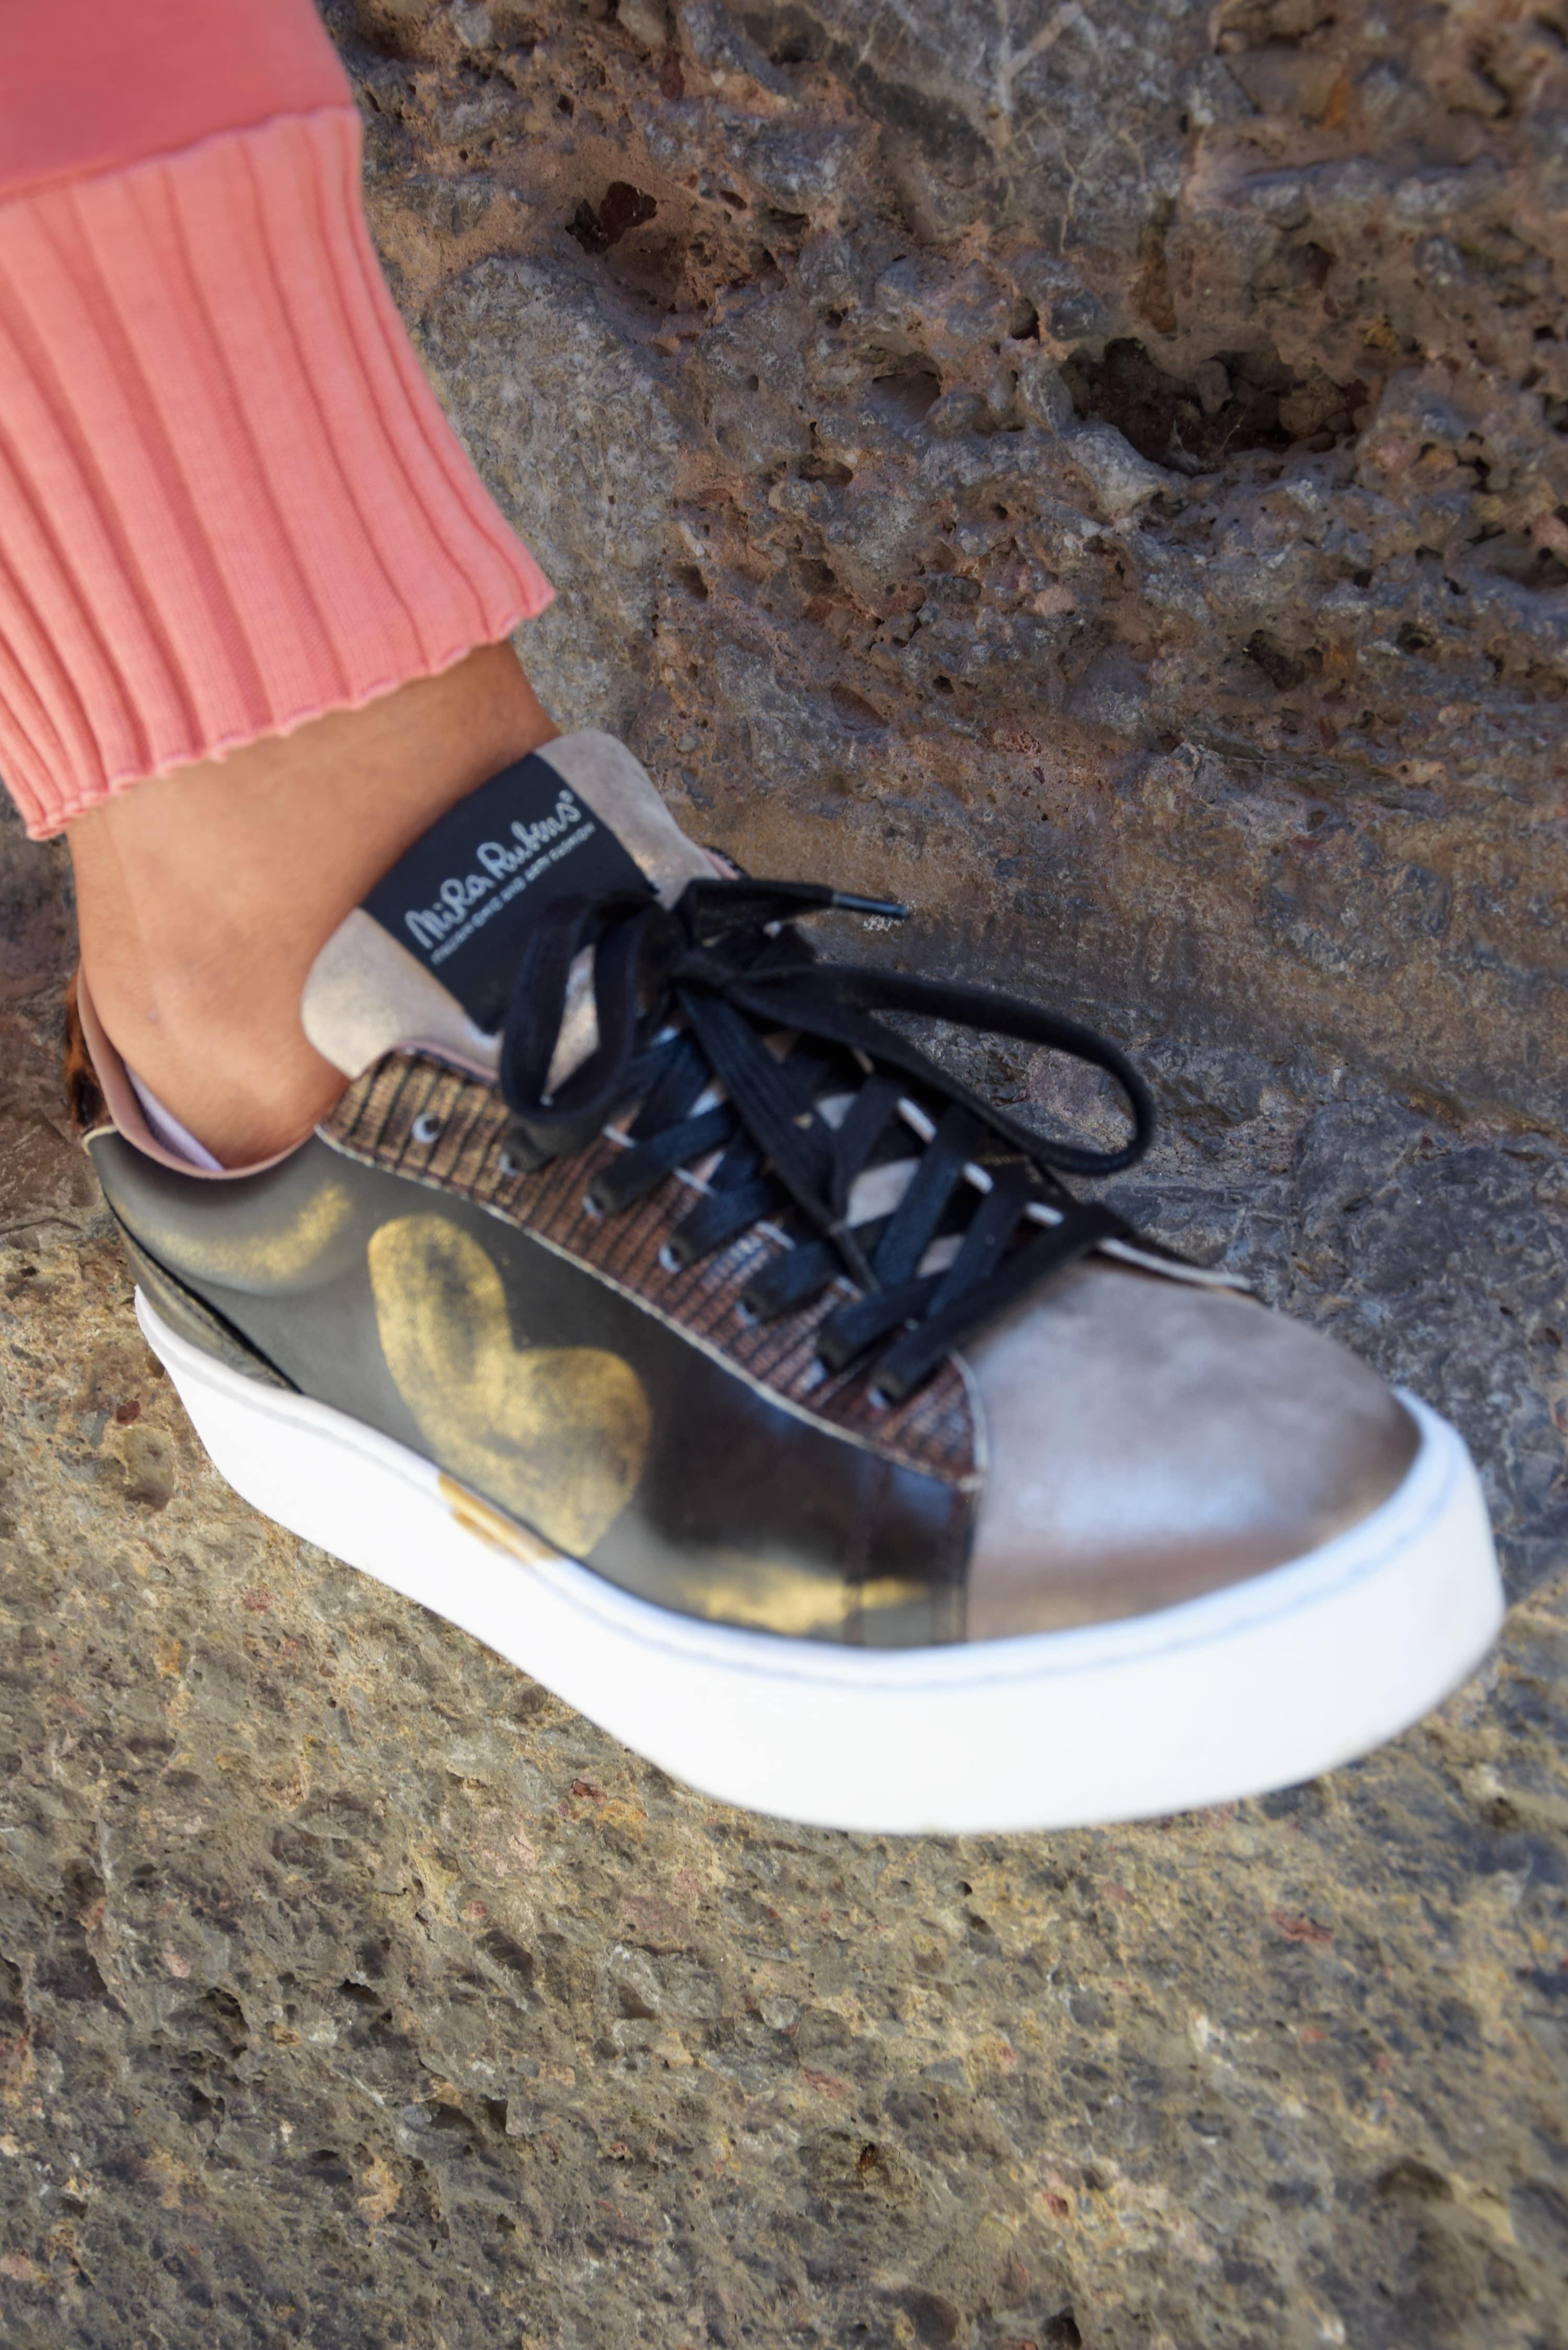 https://0501.nccdn.net/4_2/000/000/050/773/casazza_damenmode_sneaker1_1-min.jpg